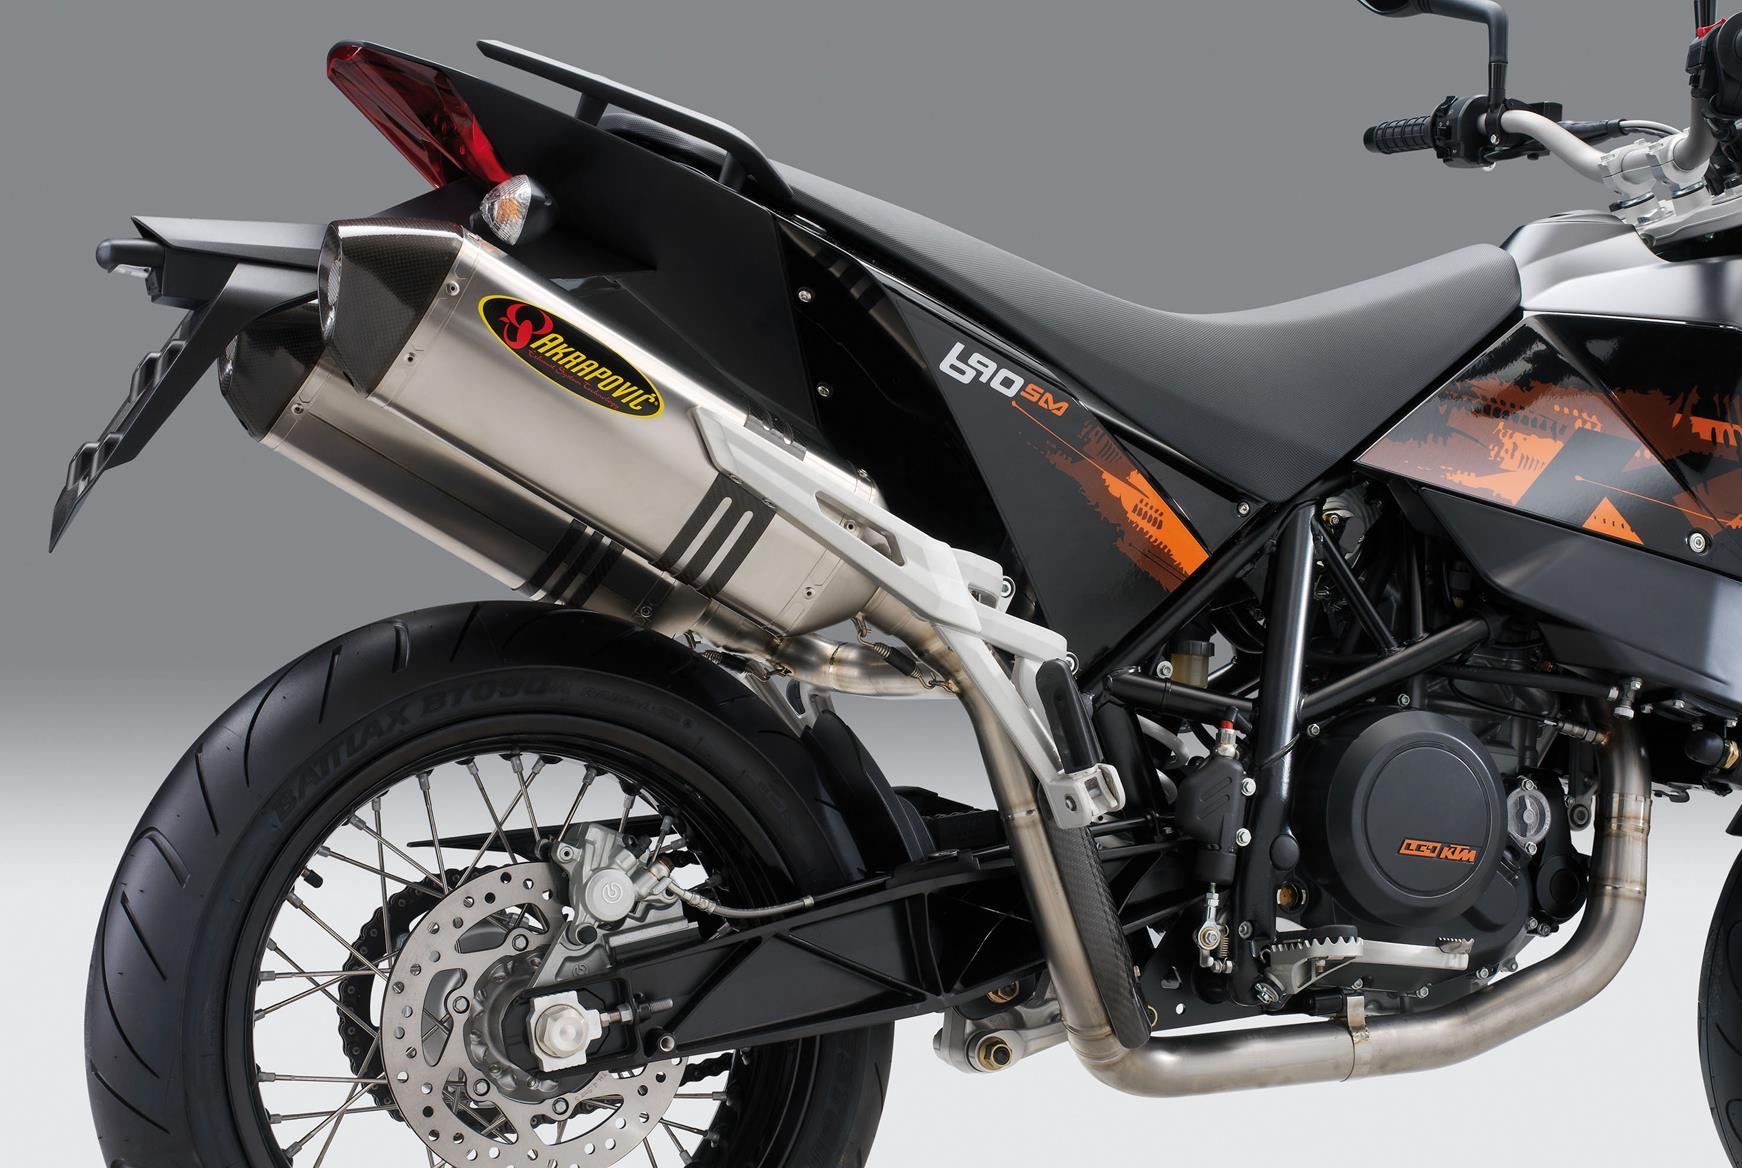 ktm 690 supermoto (2007-2011) review | mcn